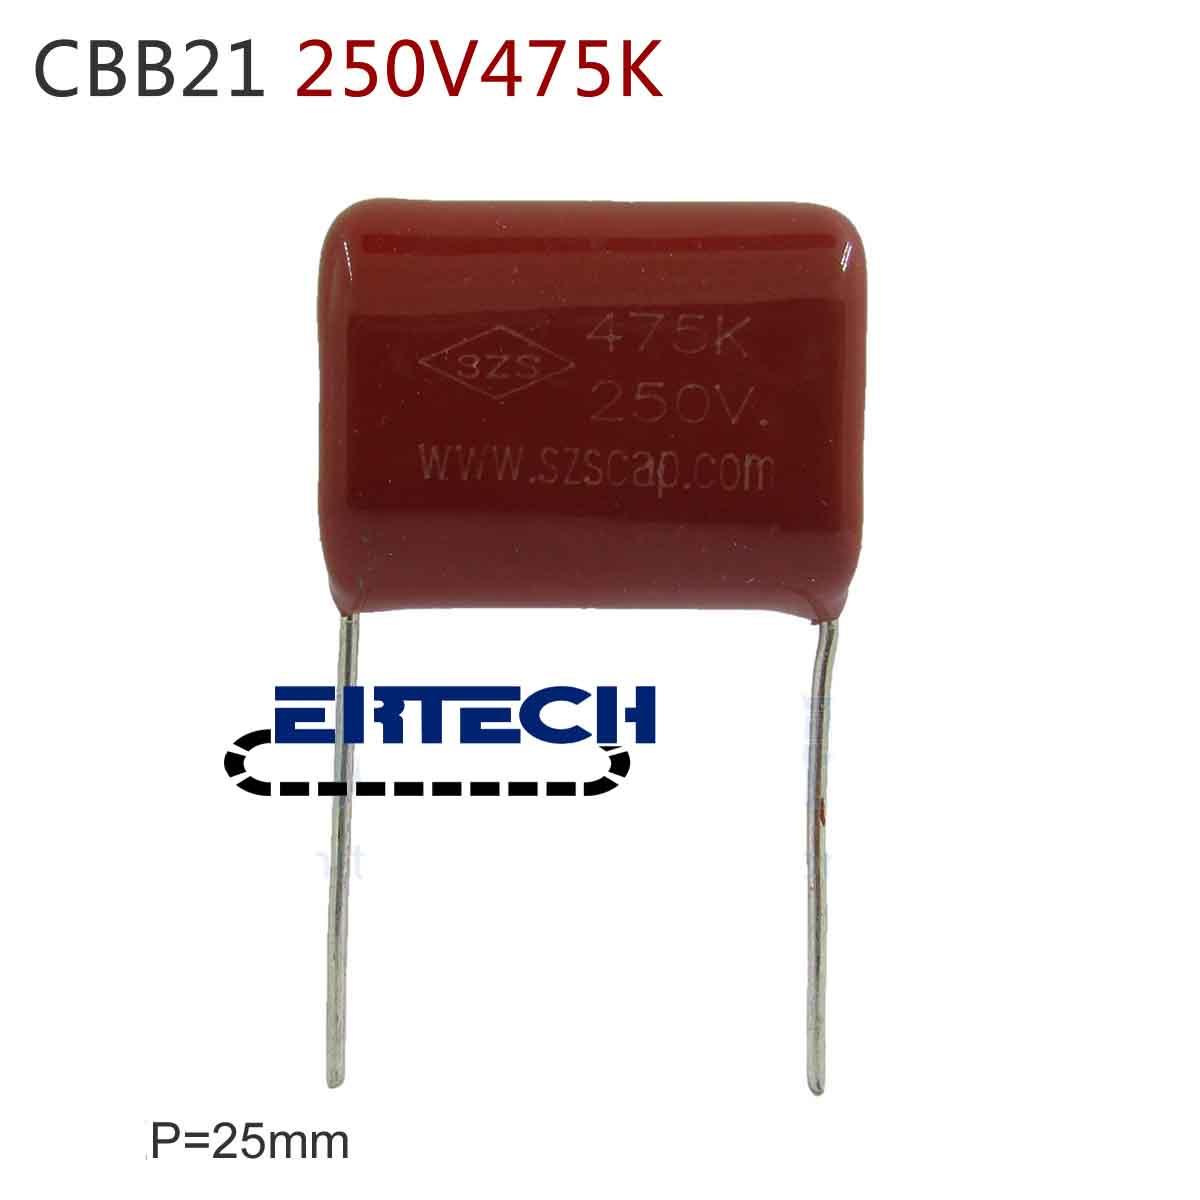 475j-250v-tu-dien-cbb-4-7uf-250v-hang-chinh-hang-dam-bao-chat-luong